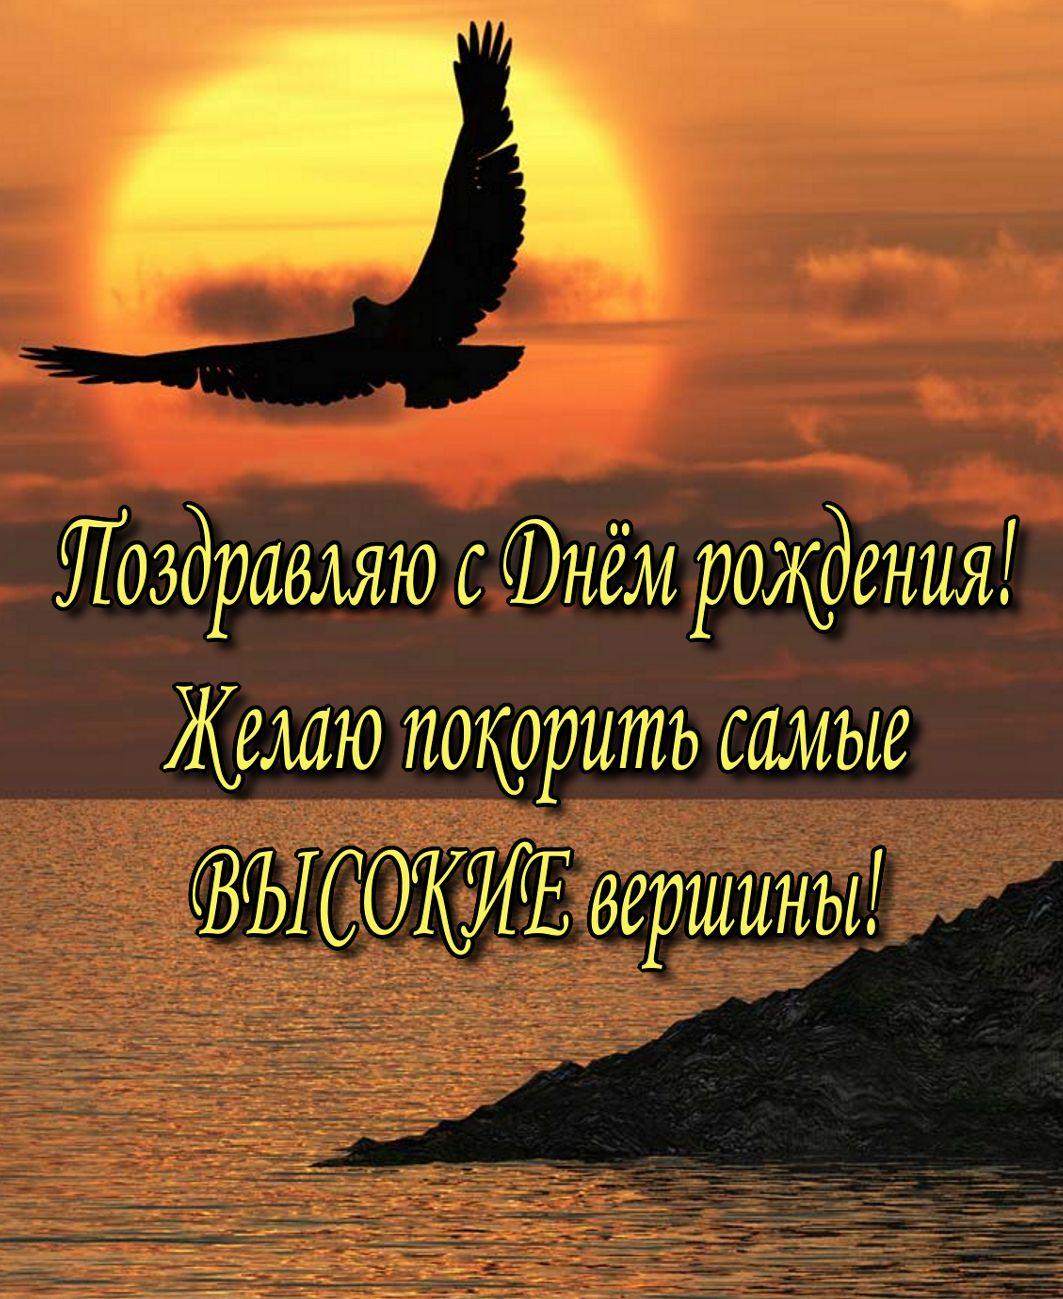 открытка с Днем рождения - орел на фоне заката над водой